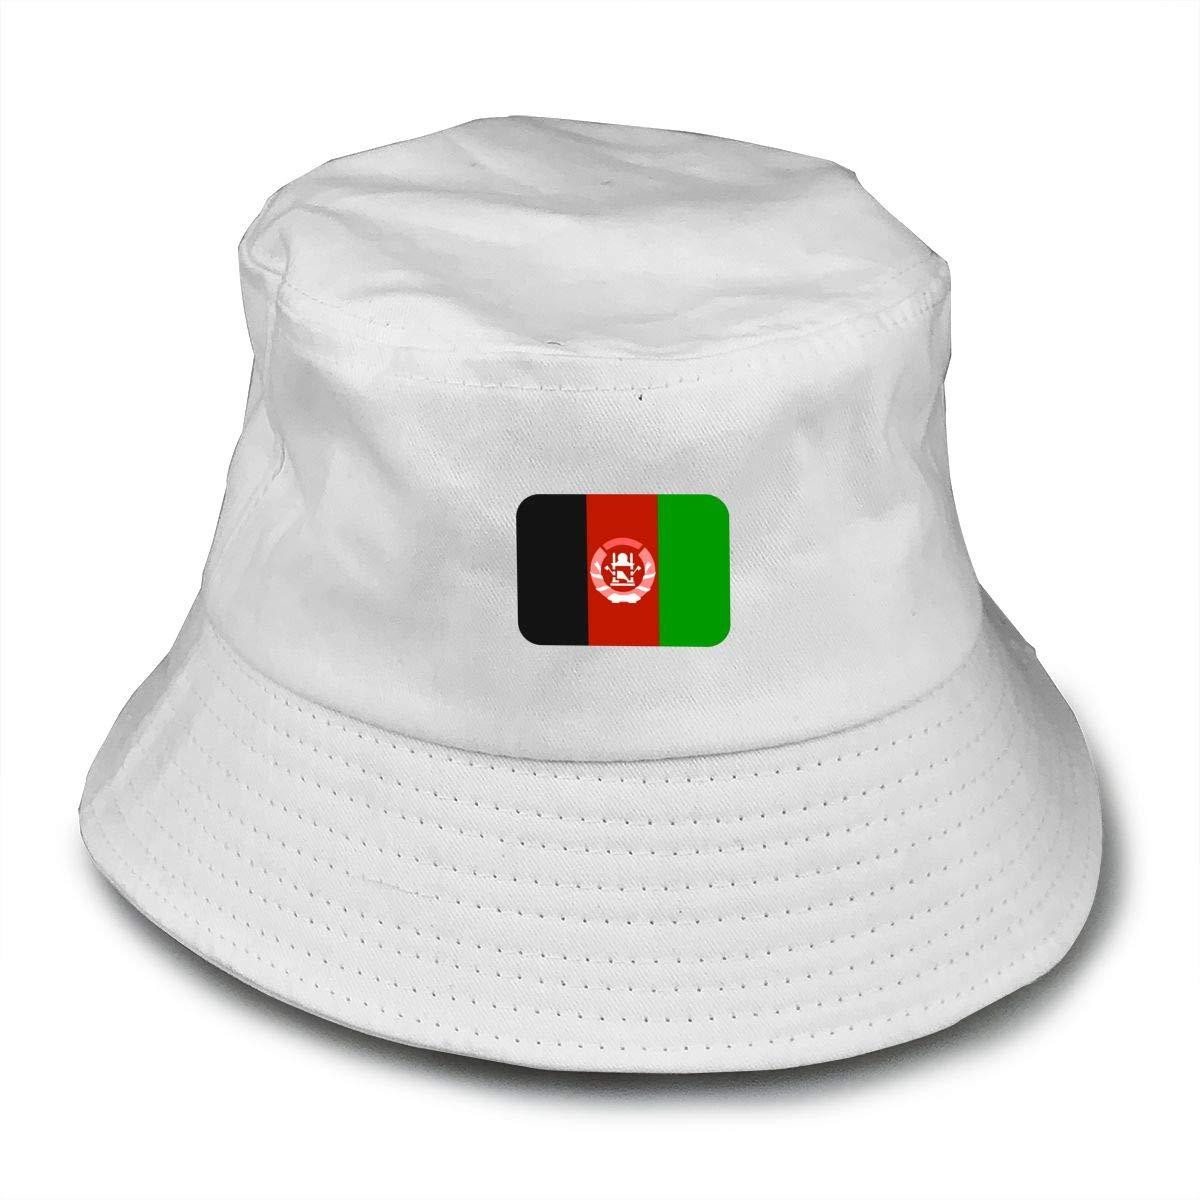 NDFGR Afghanistan Unisex Cotton Packable Black Travel Bucket Hat Fishing Cap